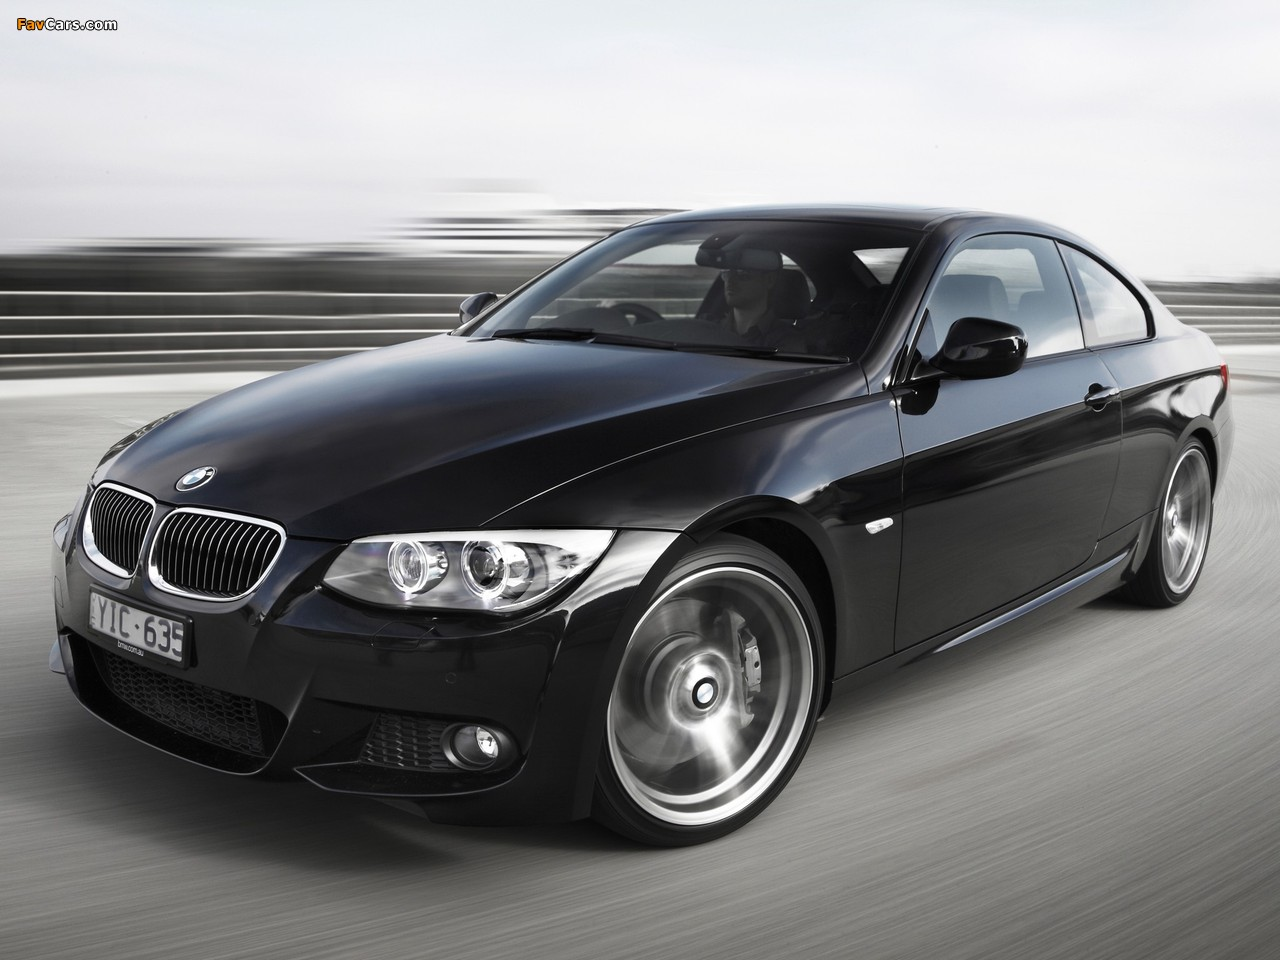 BMW 335i Wallpaper - WallpaperSafari